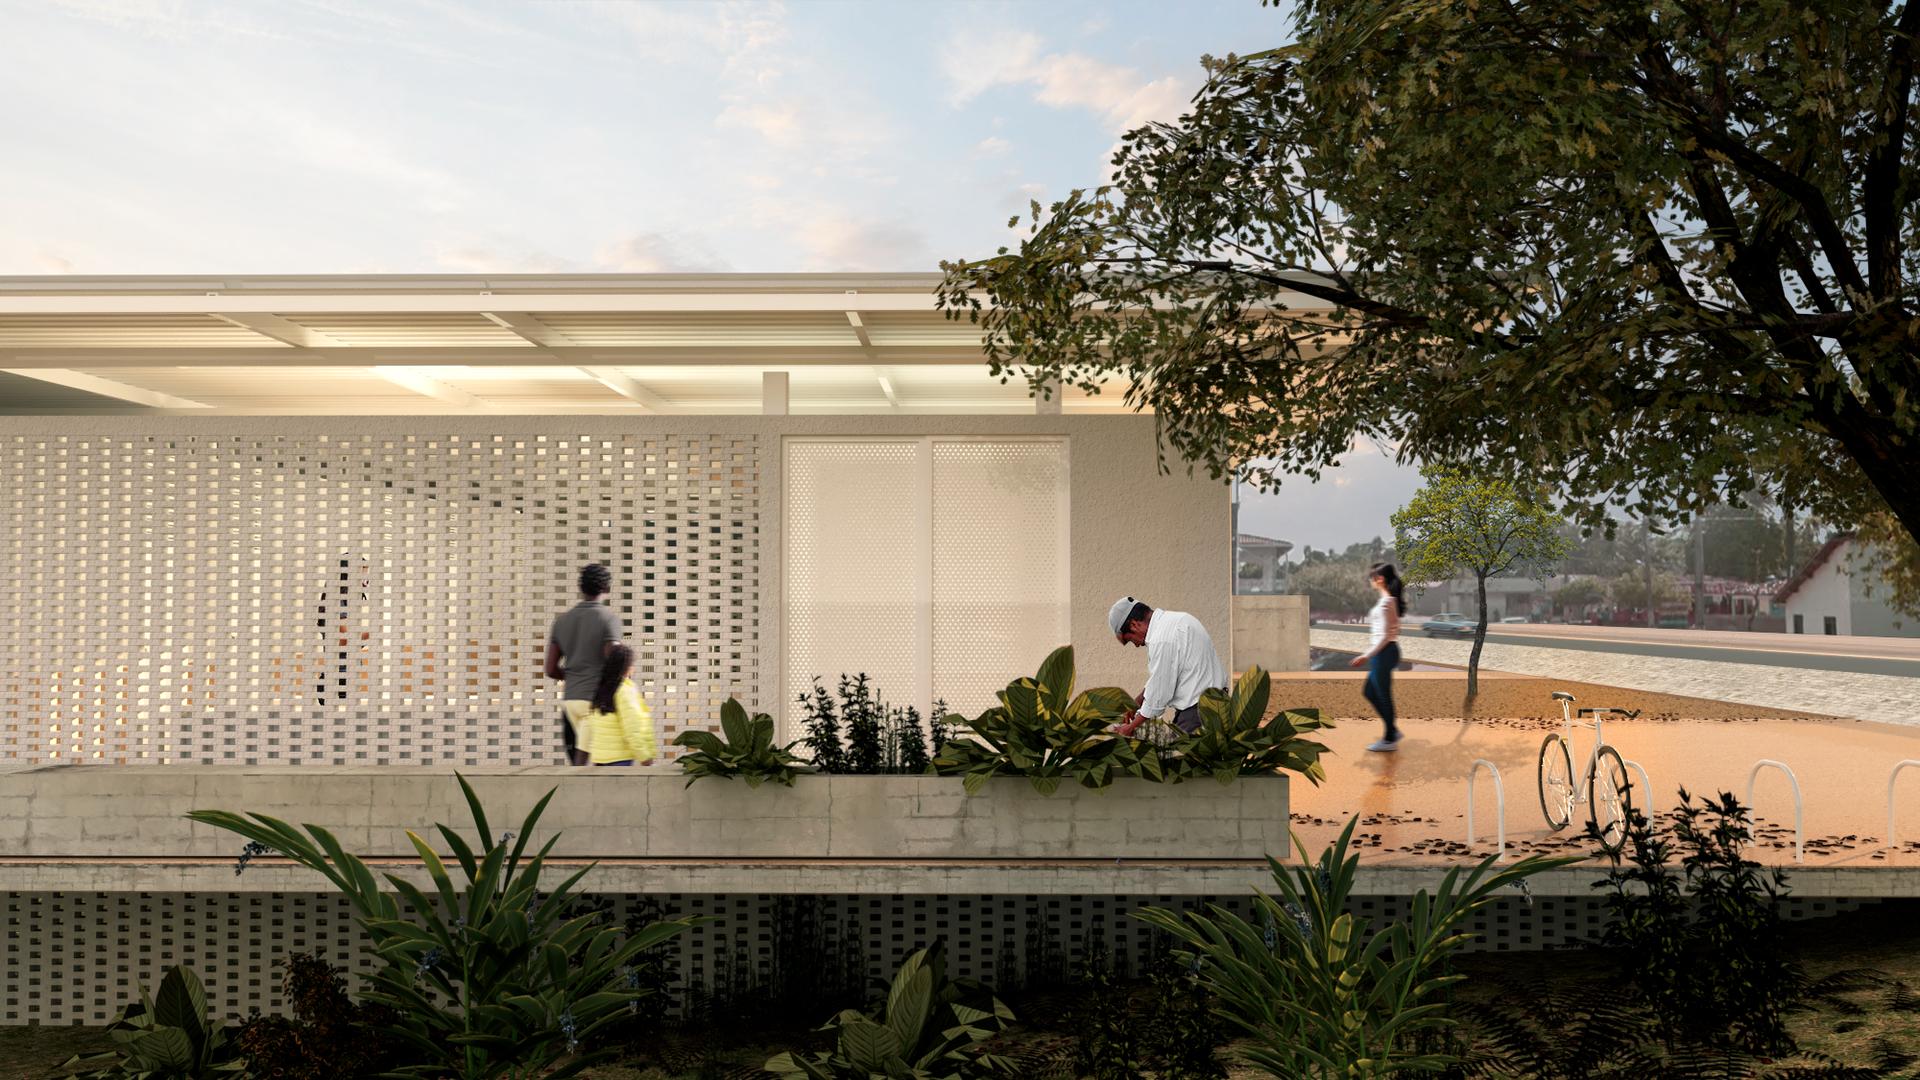 Unidade Saúde Gurugi - YVA Arquitetura 2